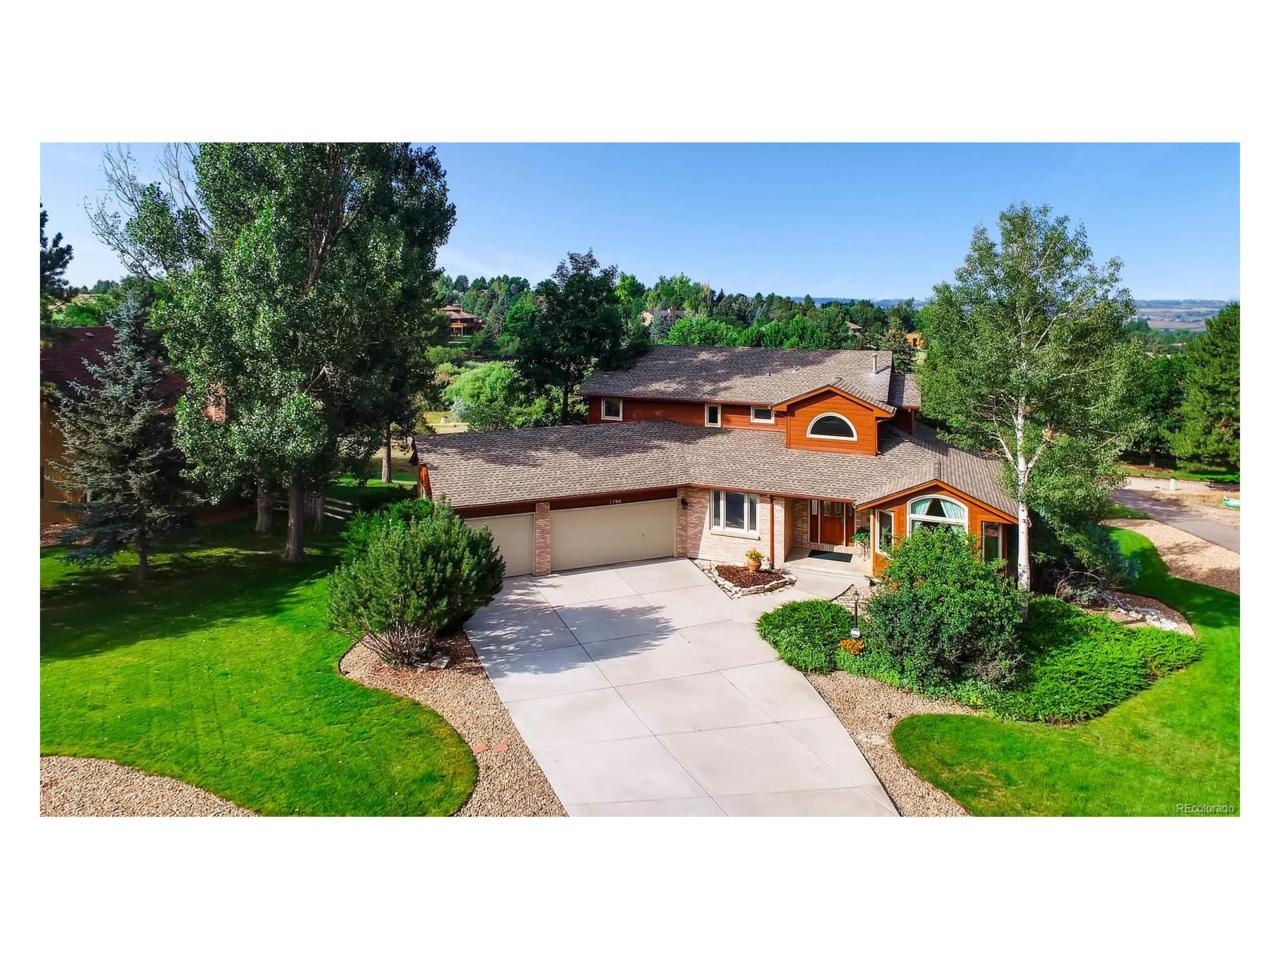 7790 Windwood Way, Parker, CO 80134 (MLS #5993927) :: 8z Real Estate